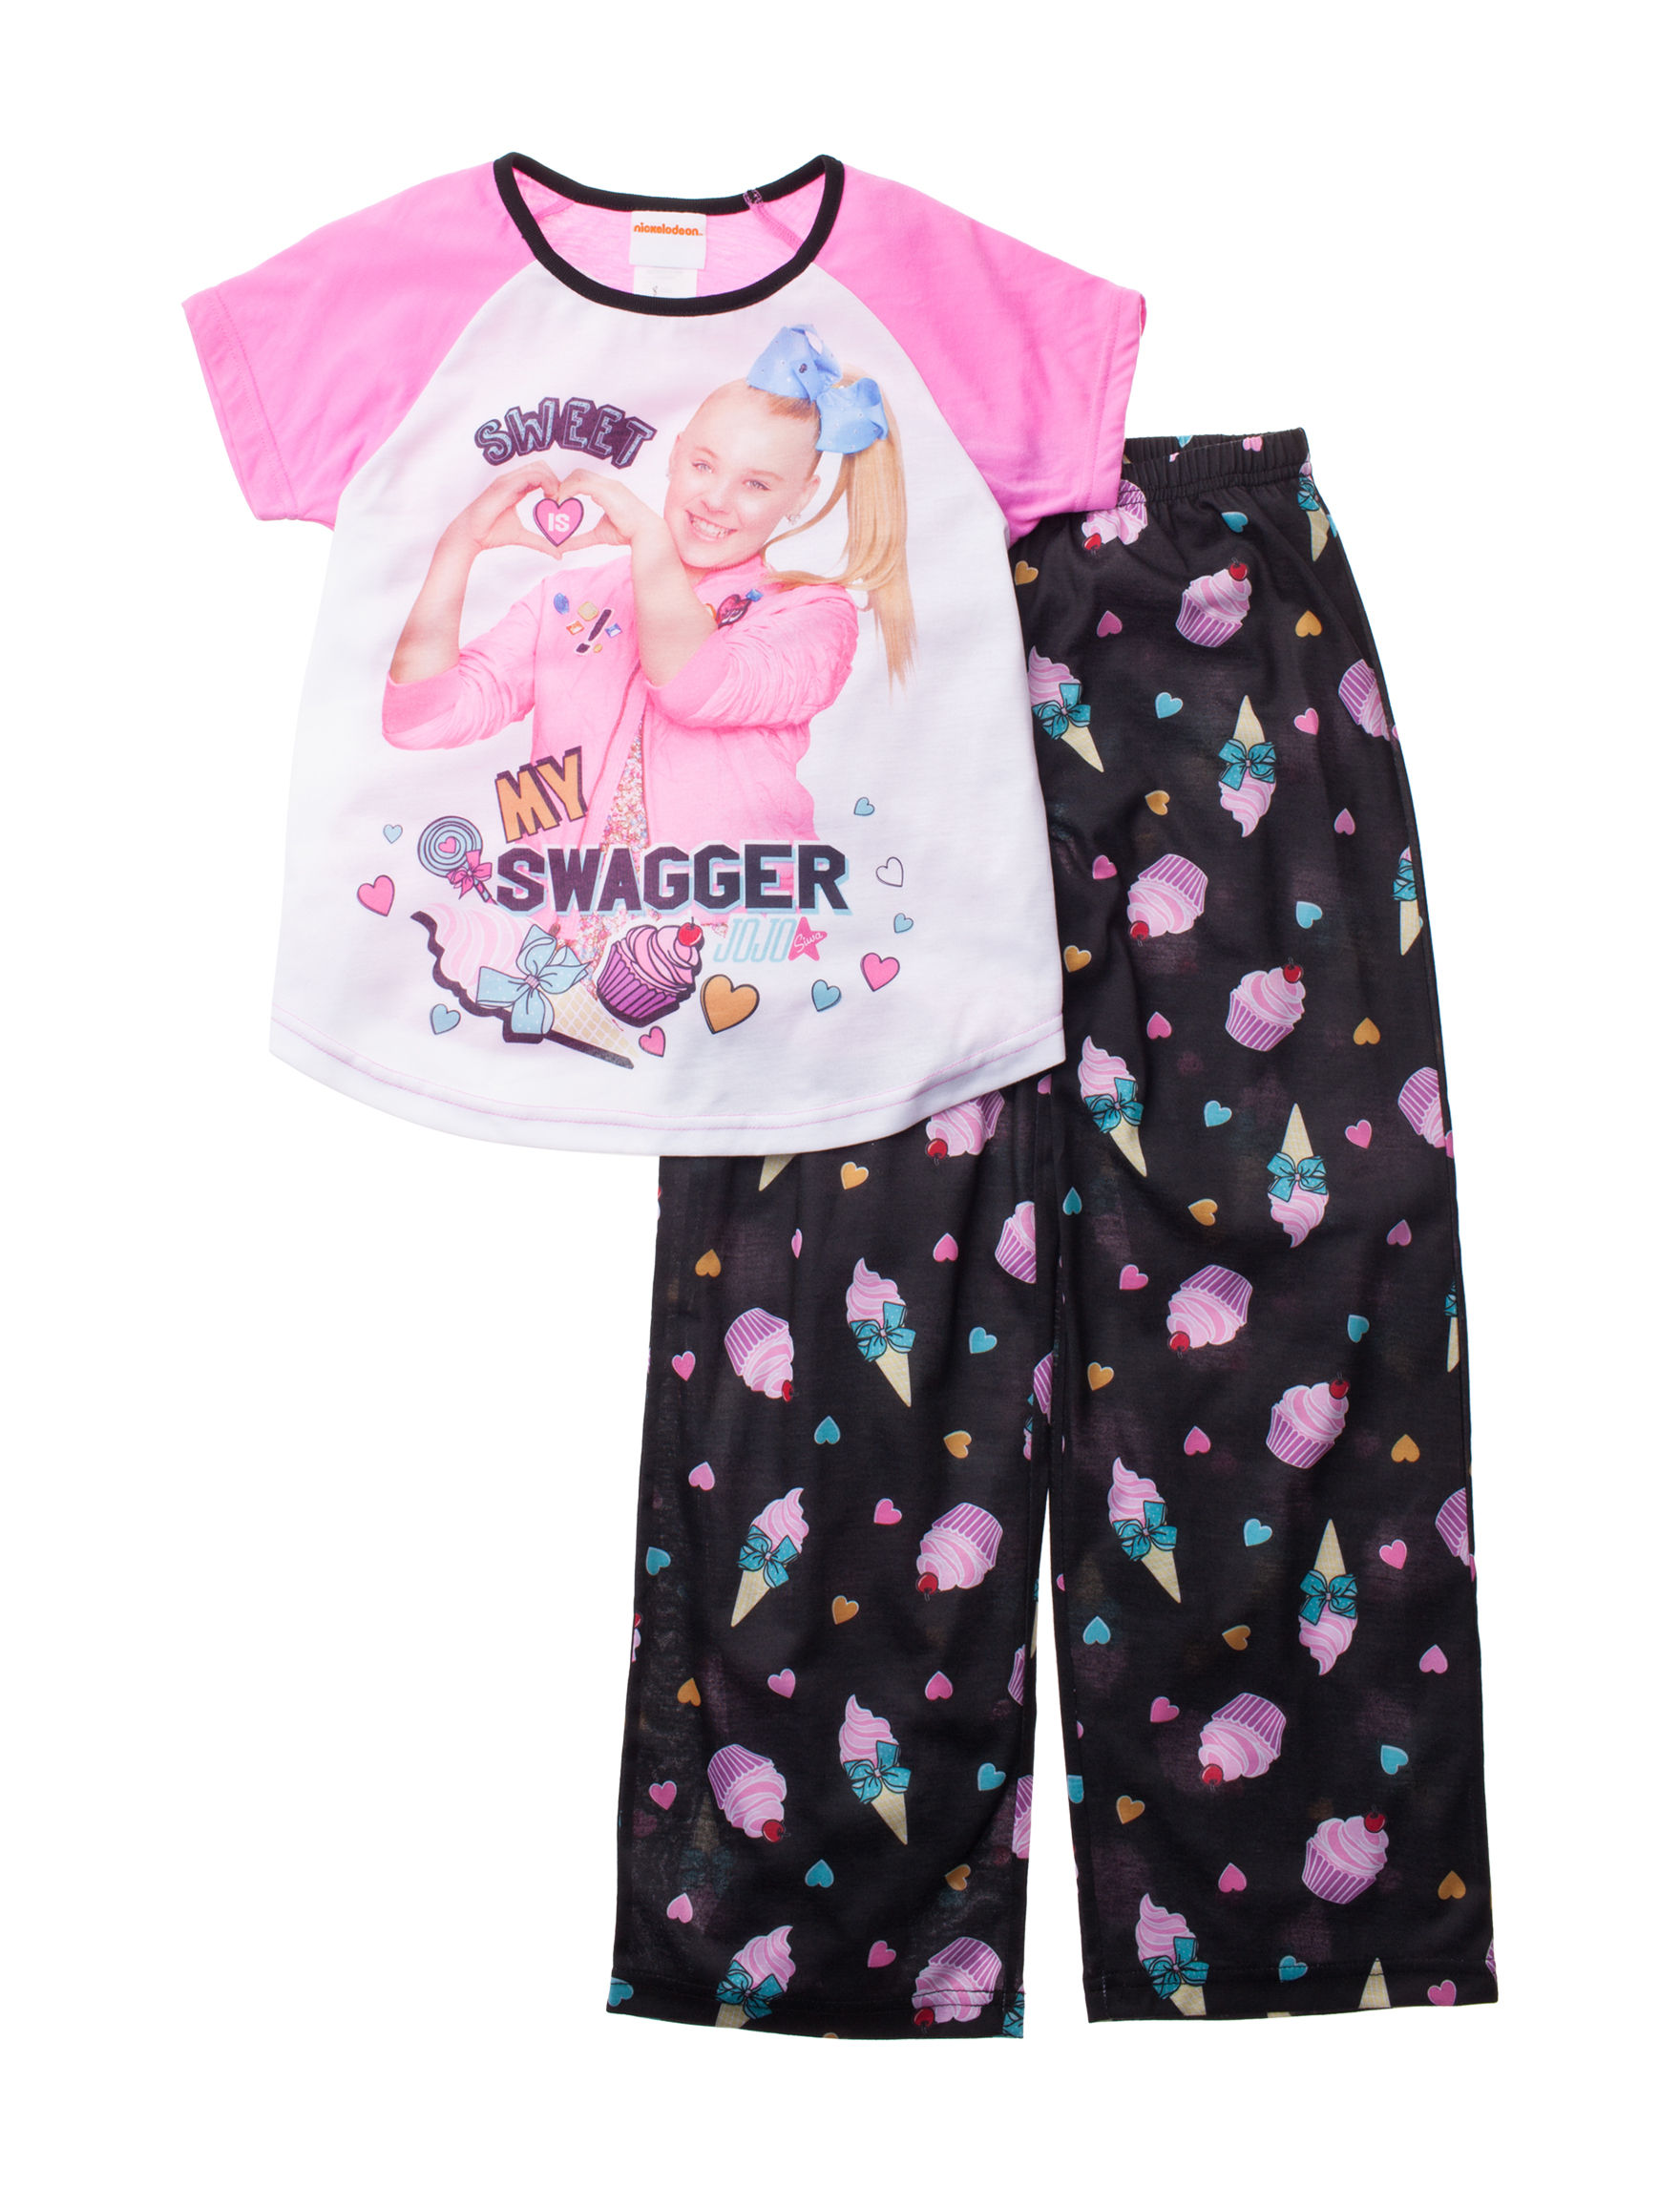 398b8f904 Nickelodeon 2-pc. Sweet is My Swagger Jojo Siwa Pajama Set - Girls 4 ...